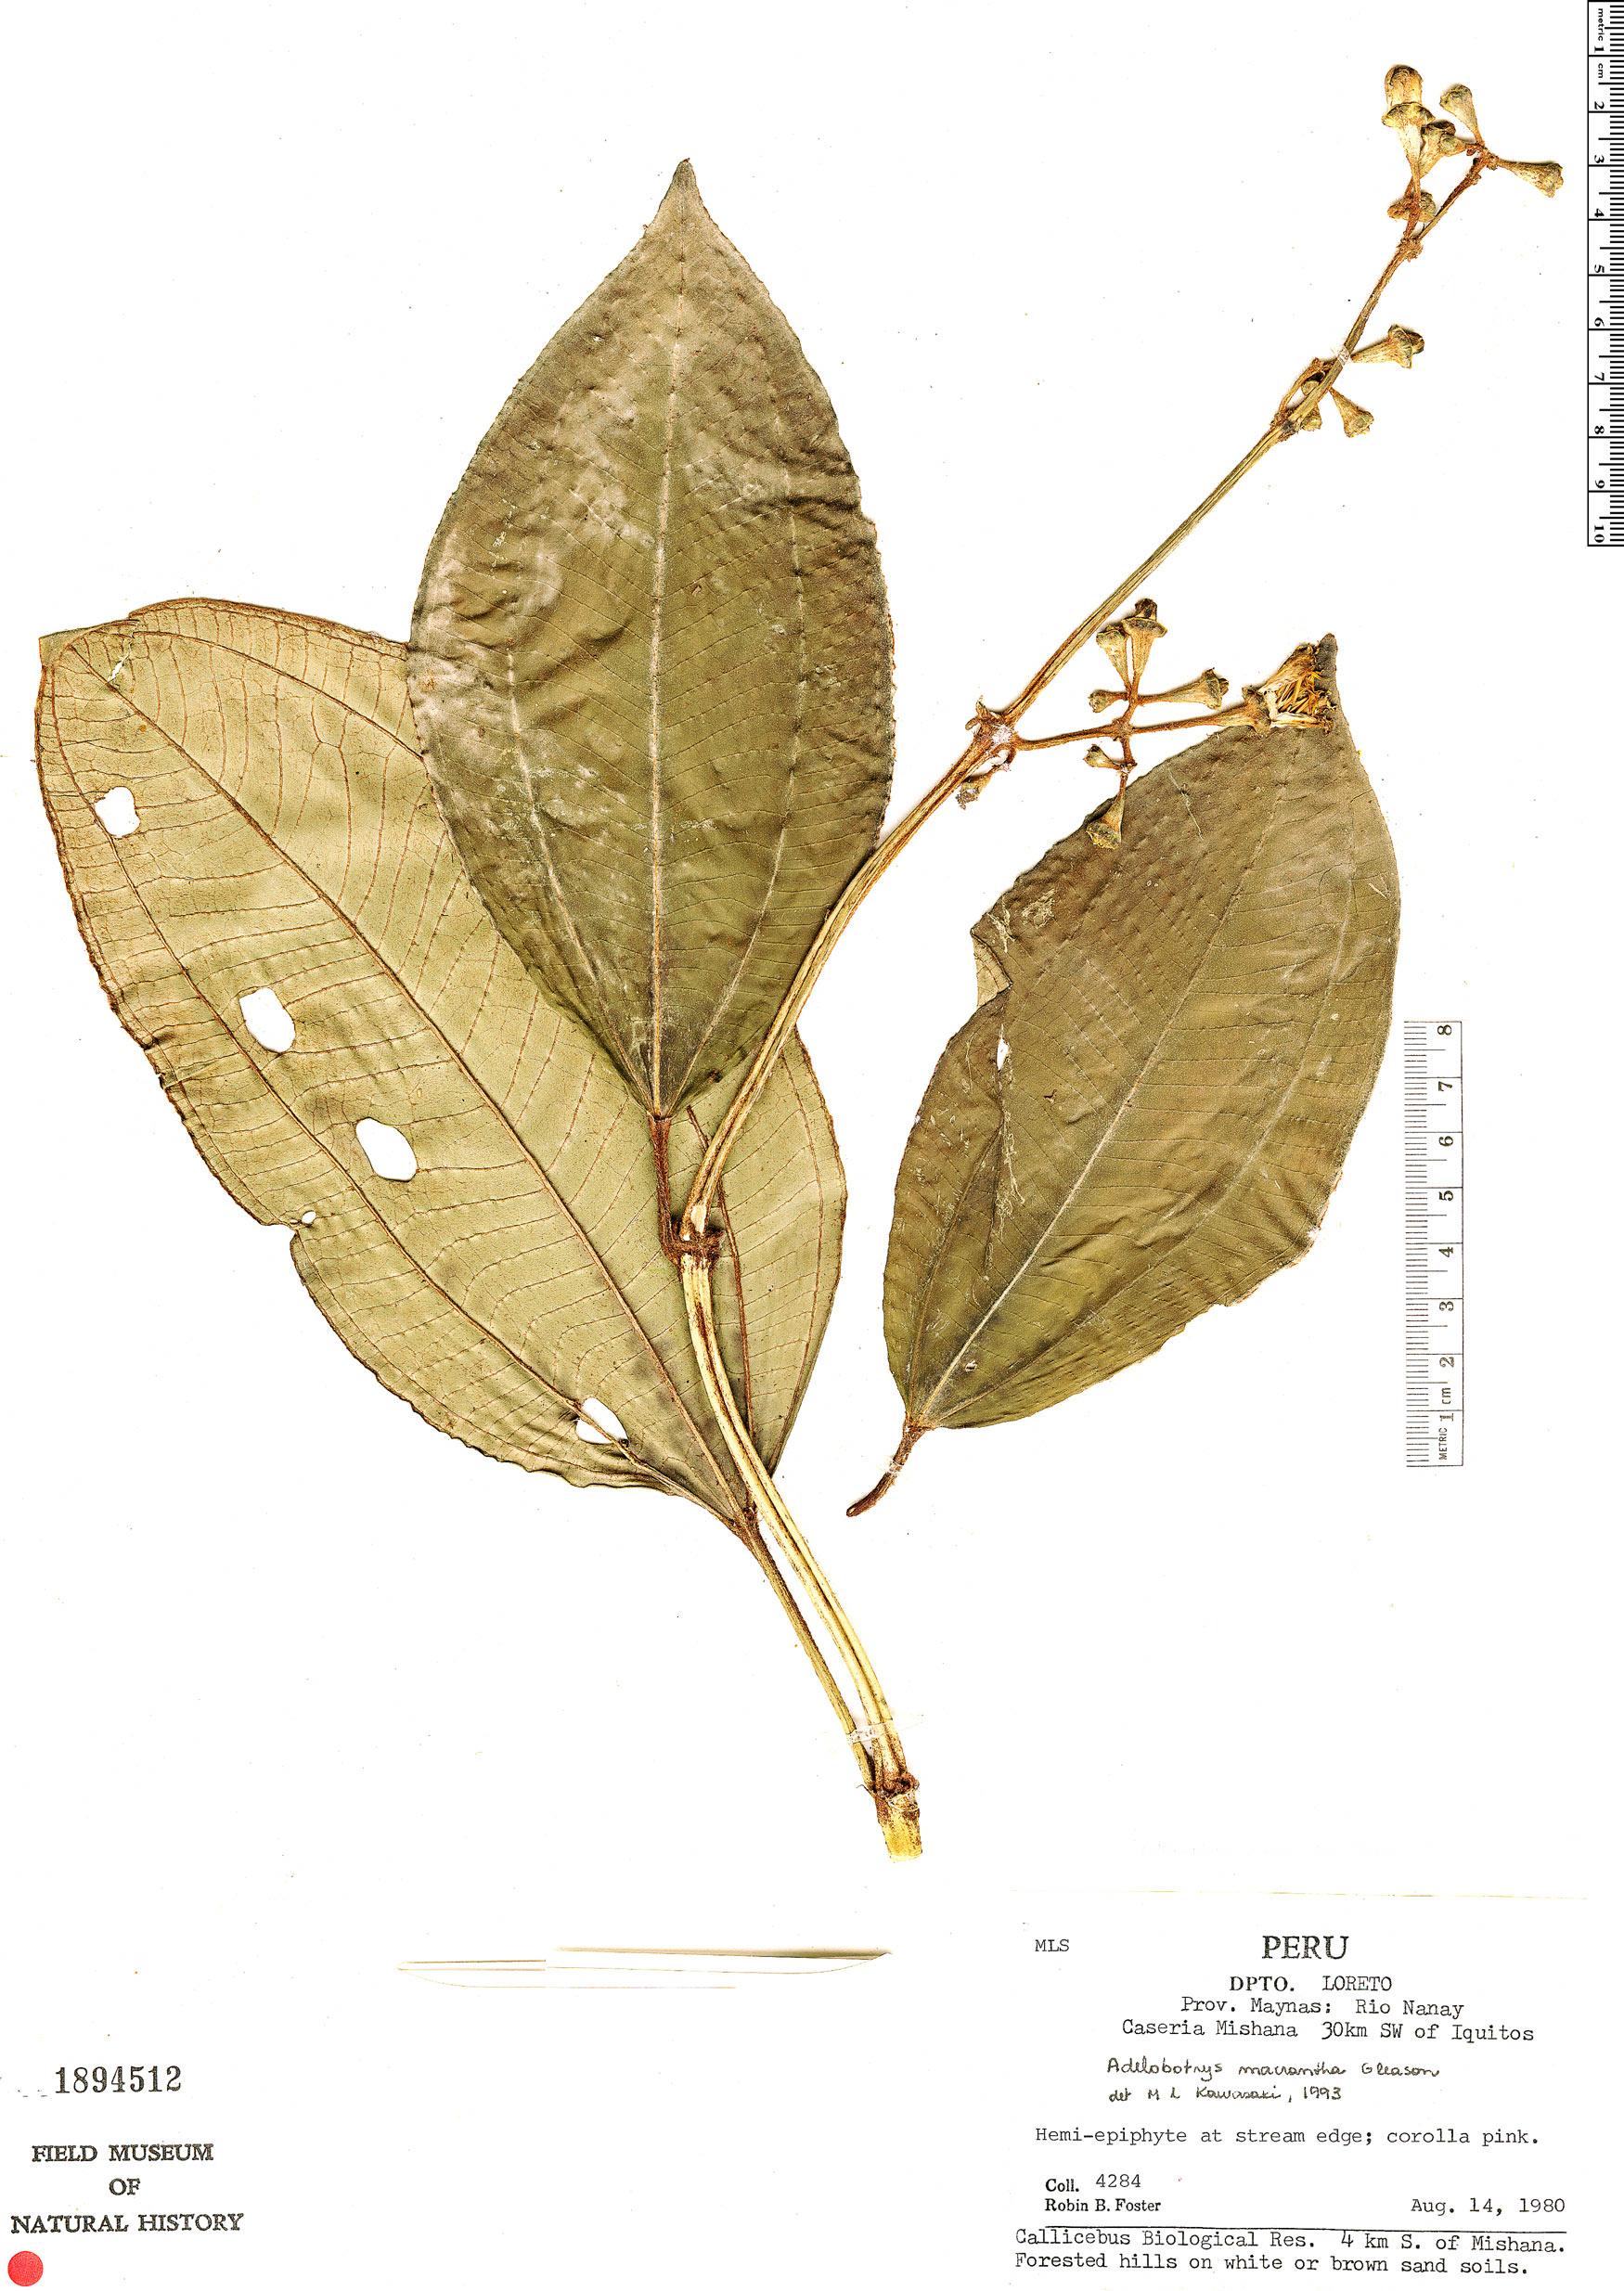 Specimen: Adelobotrys macrantha